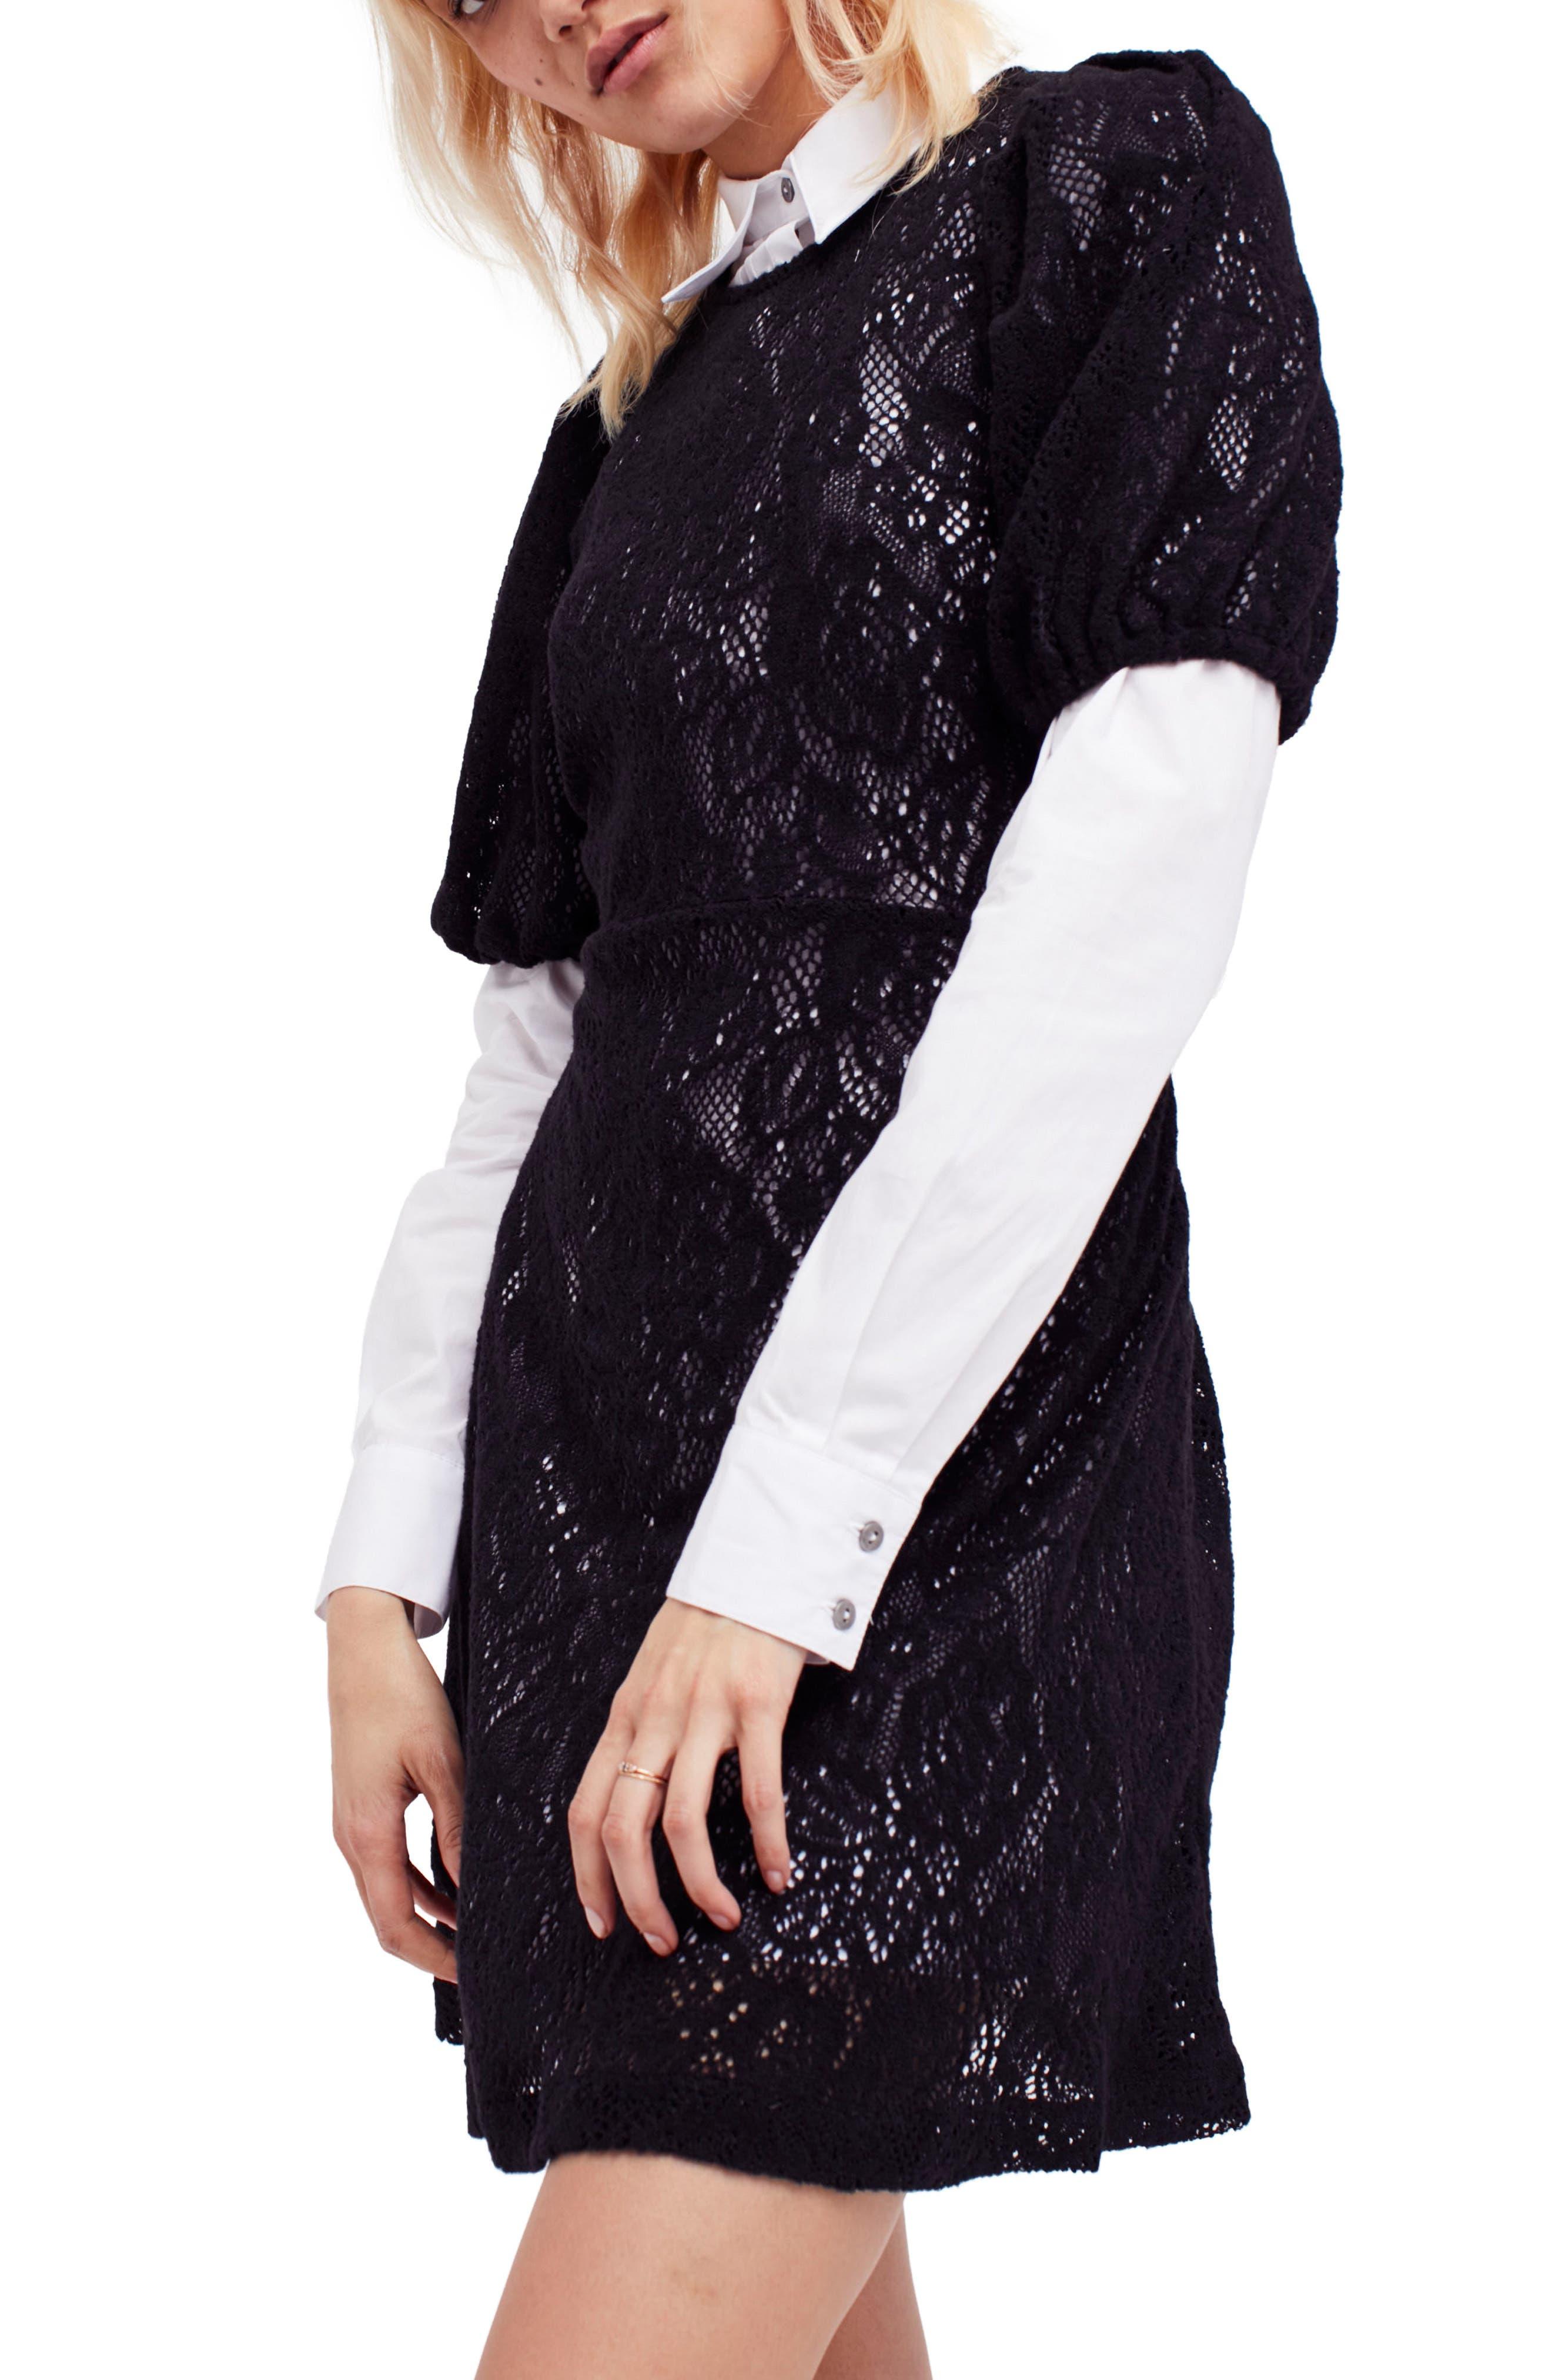 Free People Pretty Princess Dress Shirtdress with Lace Overlay